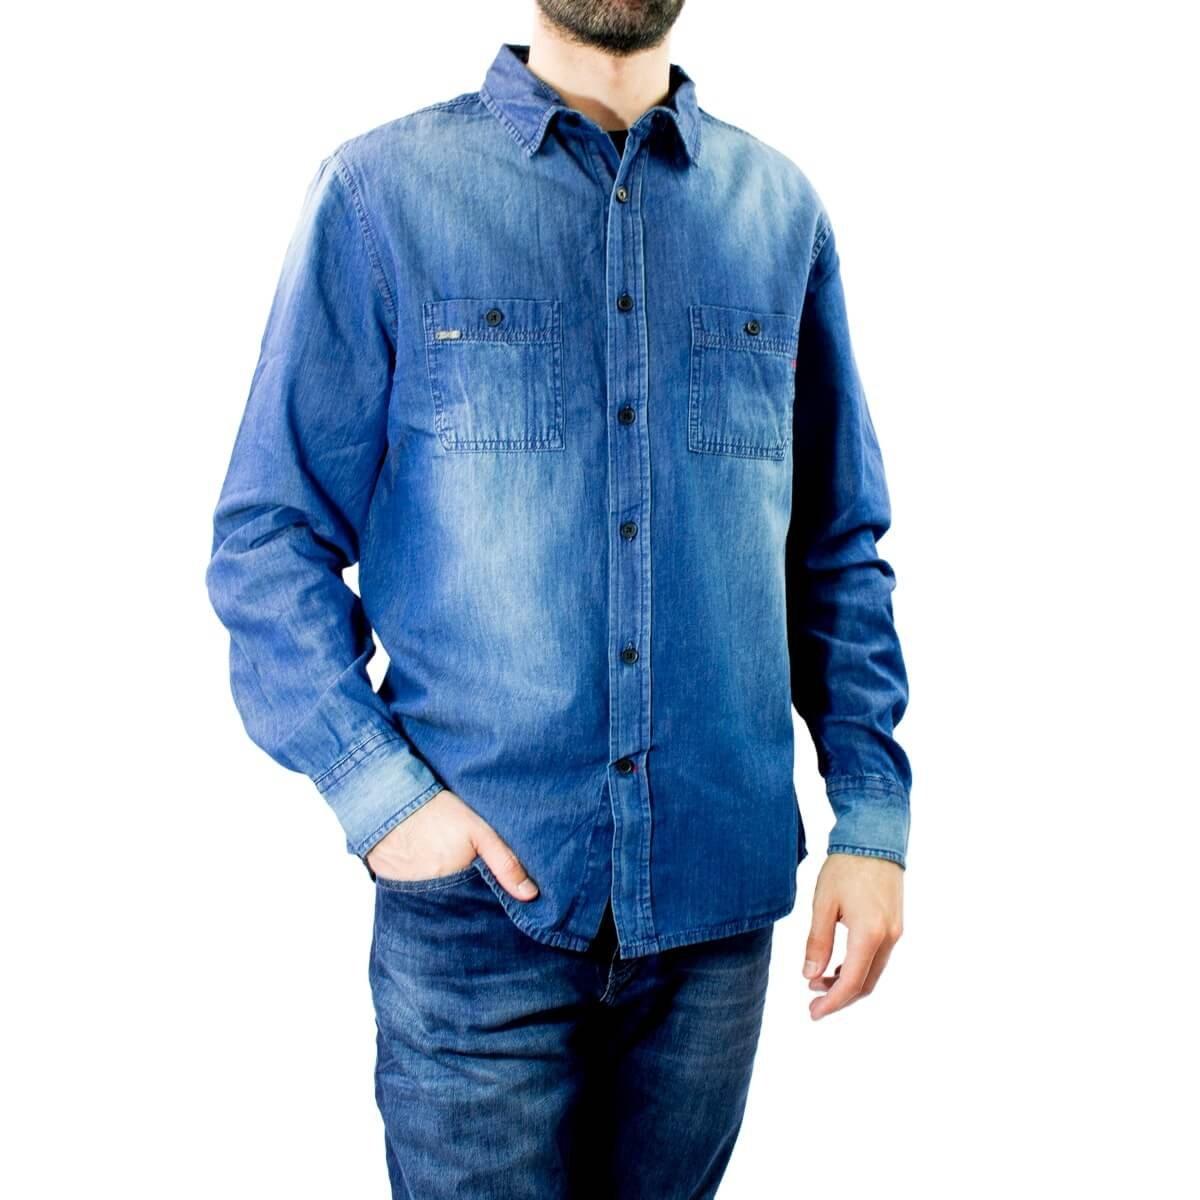 a1a19c33ed Bizz Store - Camisa Jeans Masculina Dixie Manga Longa